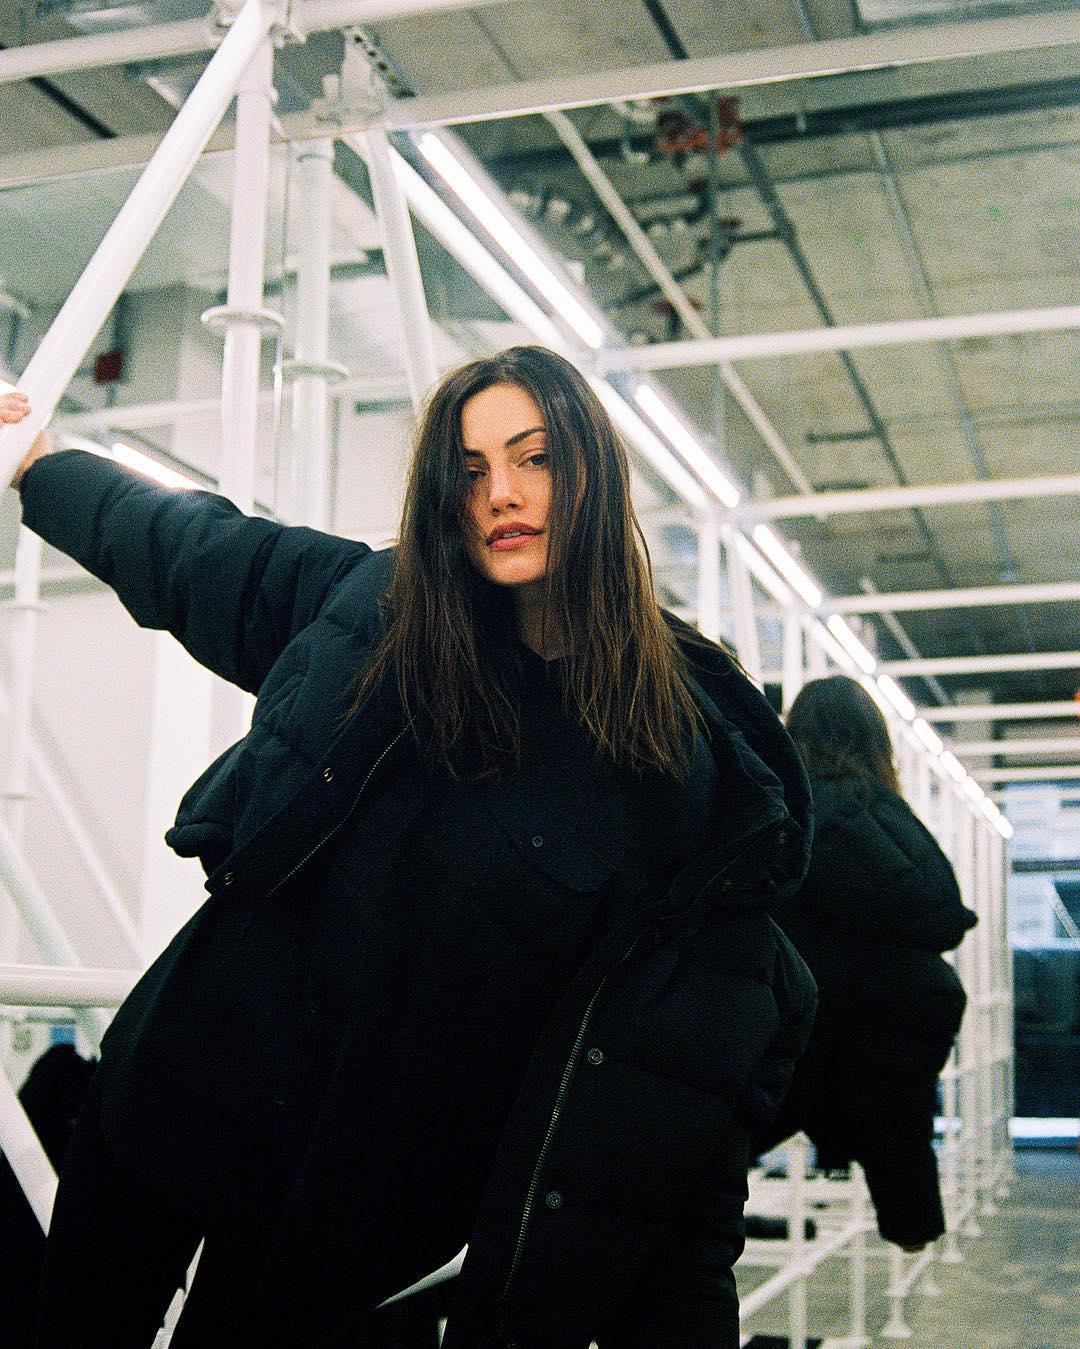 Phoebe-Tonkin-Wallpapers-Insta-Fit-Bio-5